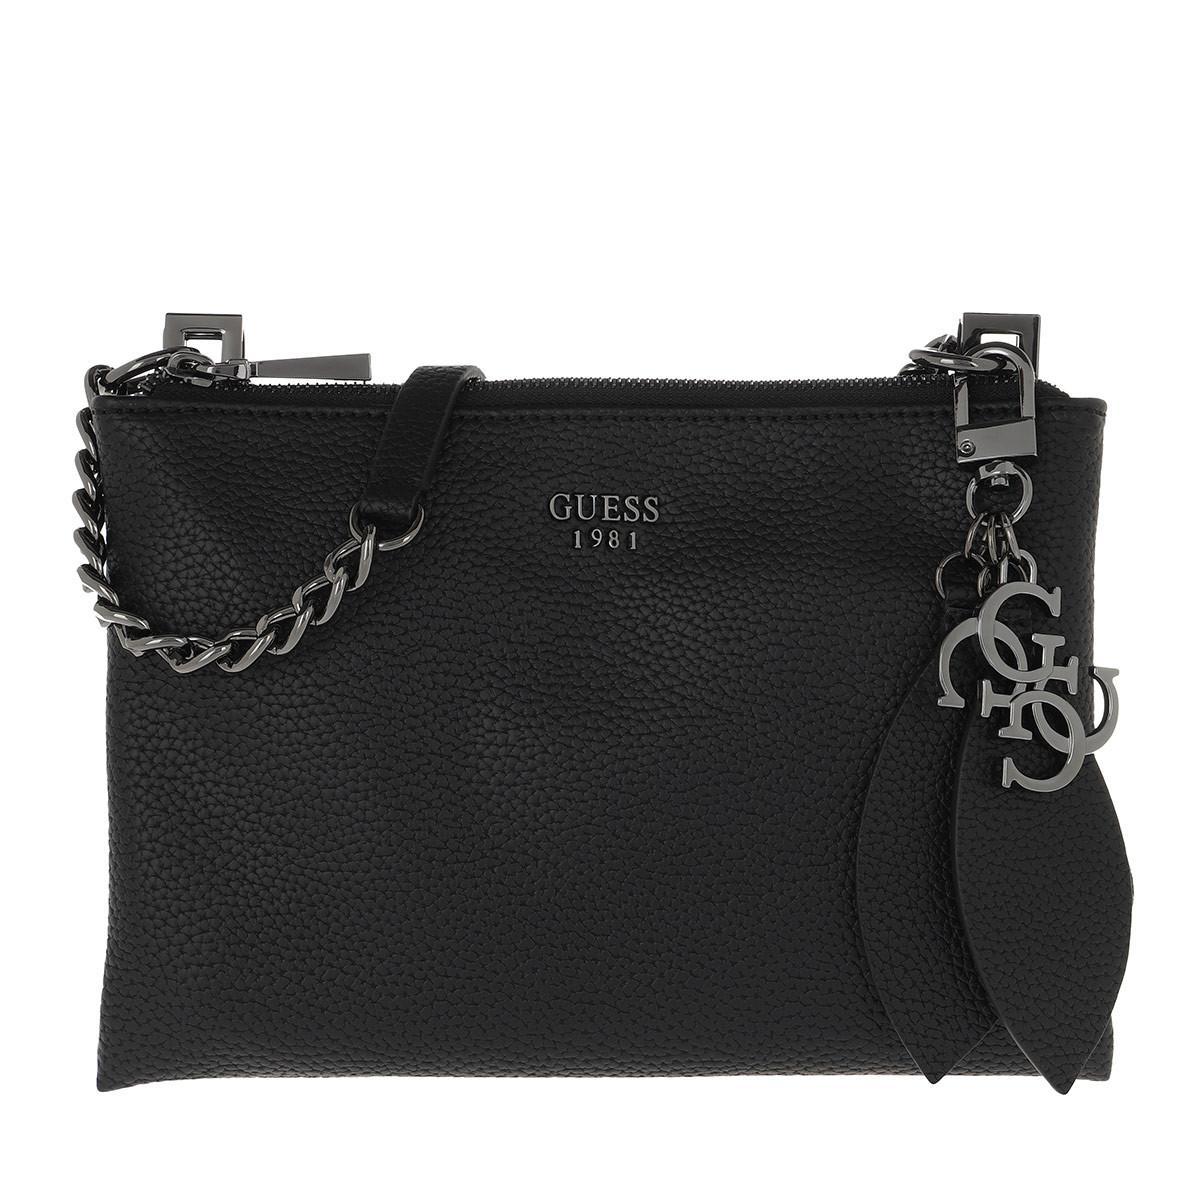 Guess. Women's Lou Lou Mini Crossbody Bag Top Zipper Black